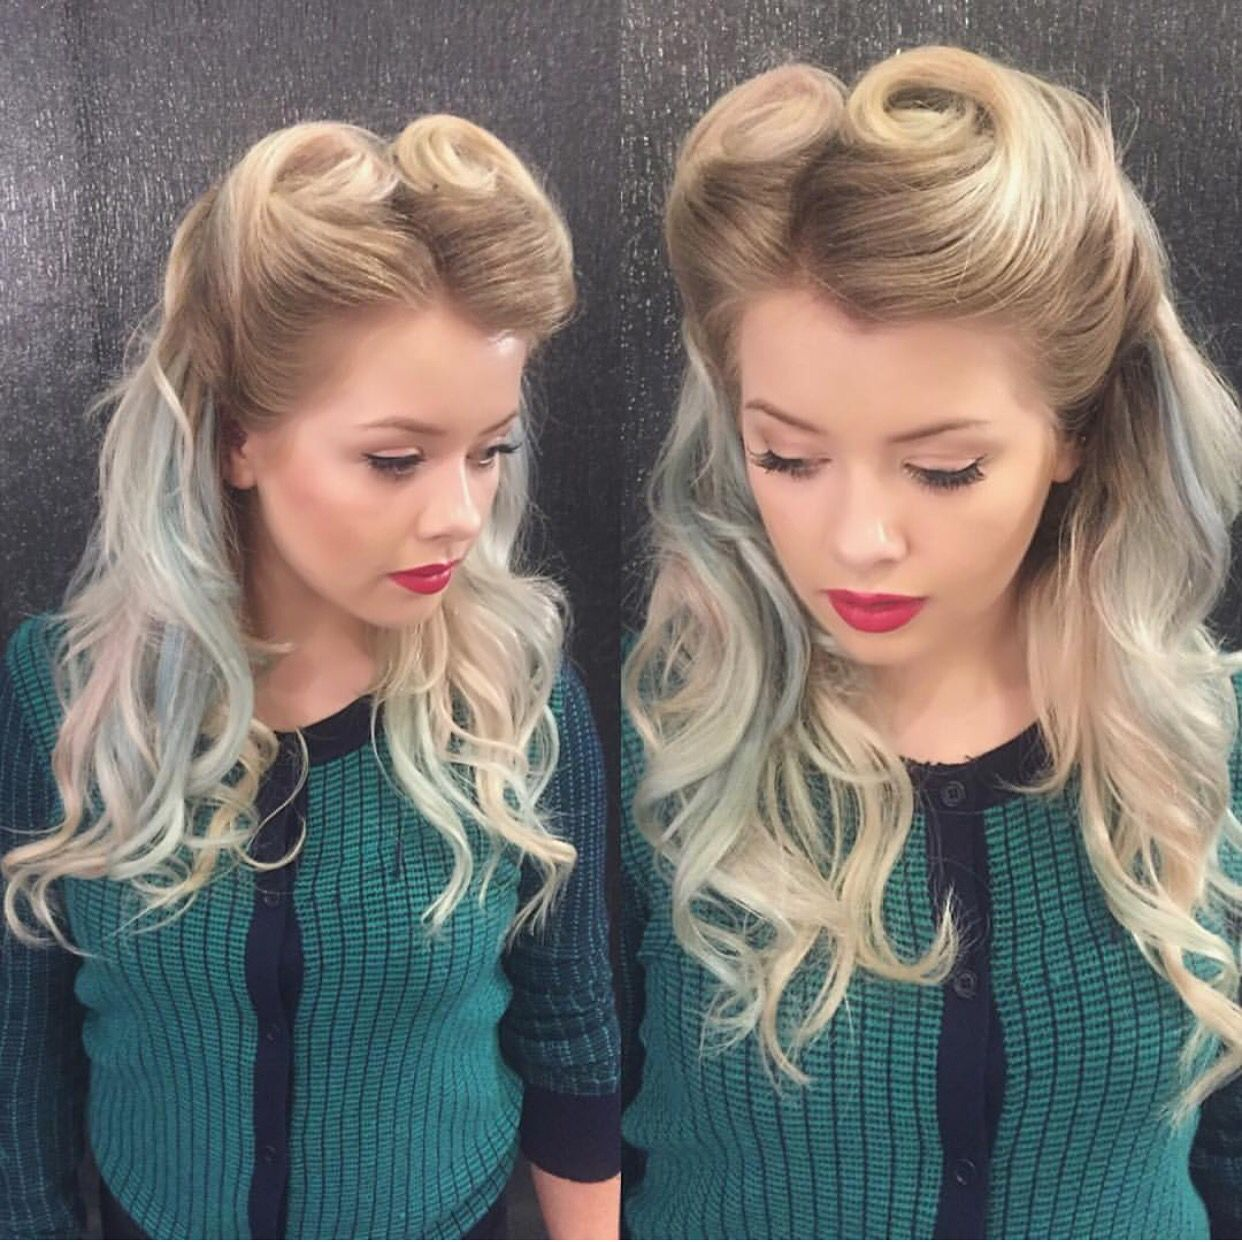 best 25+ victory rolls ideas on pinterest | vintage hair, victory